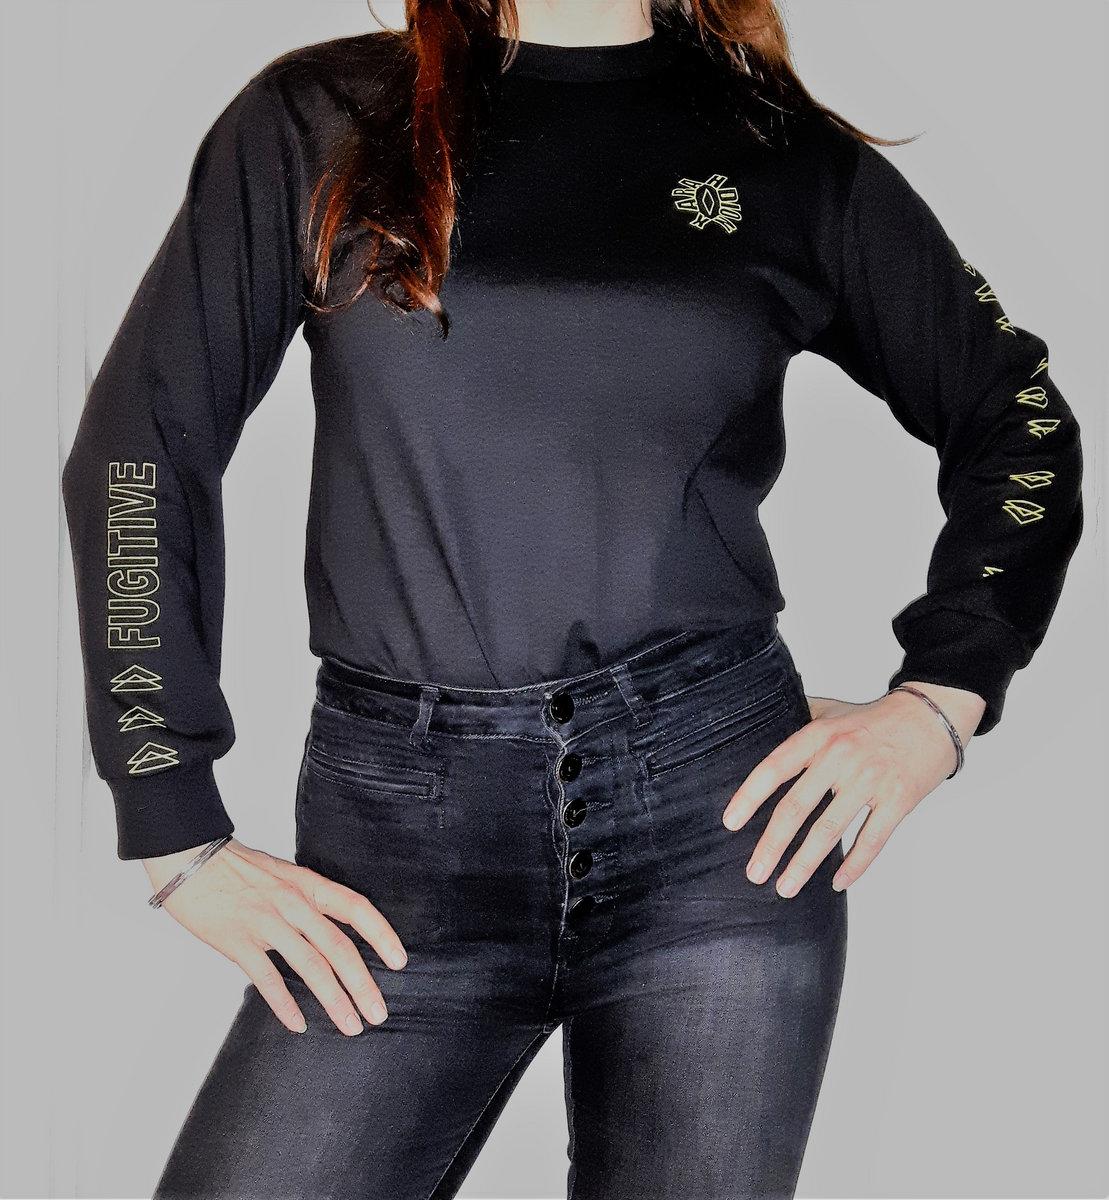 Shirt design on sleeve - Fugitive Design Long Sleeve T Shirt Main Photo